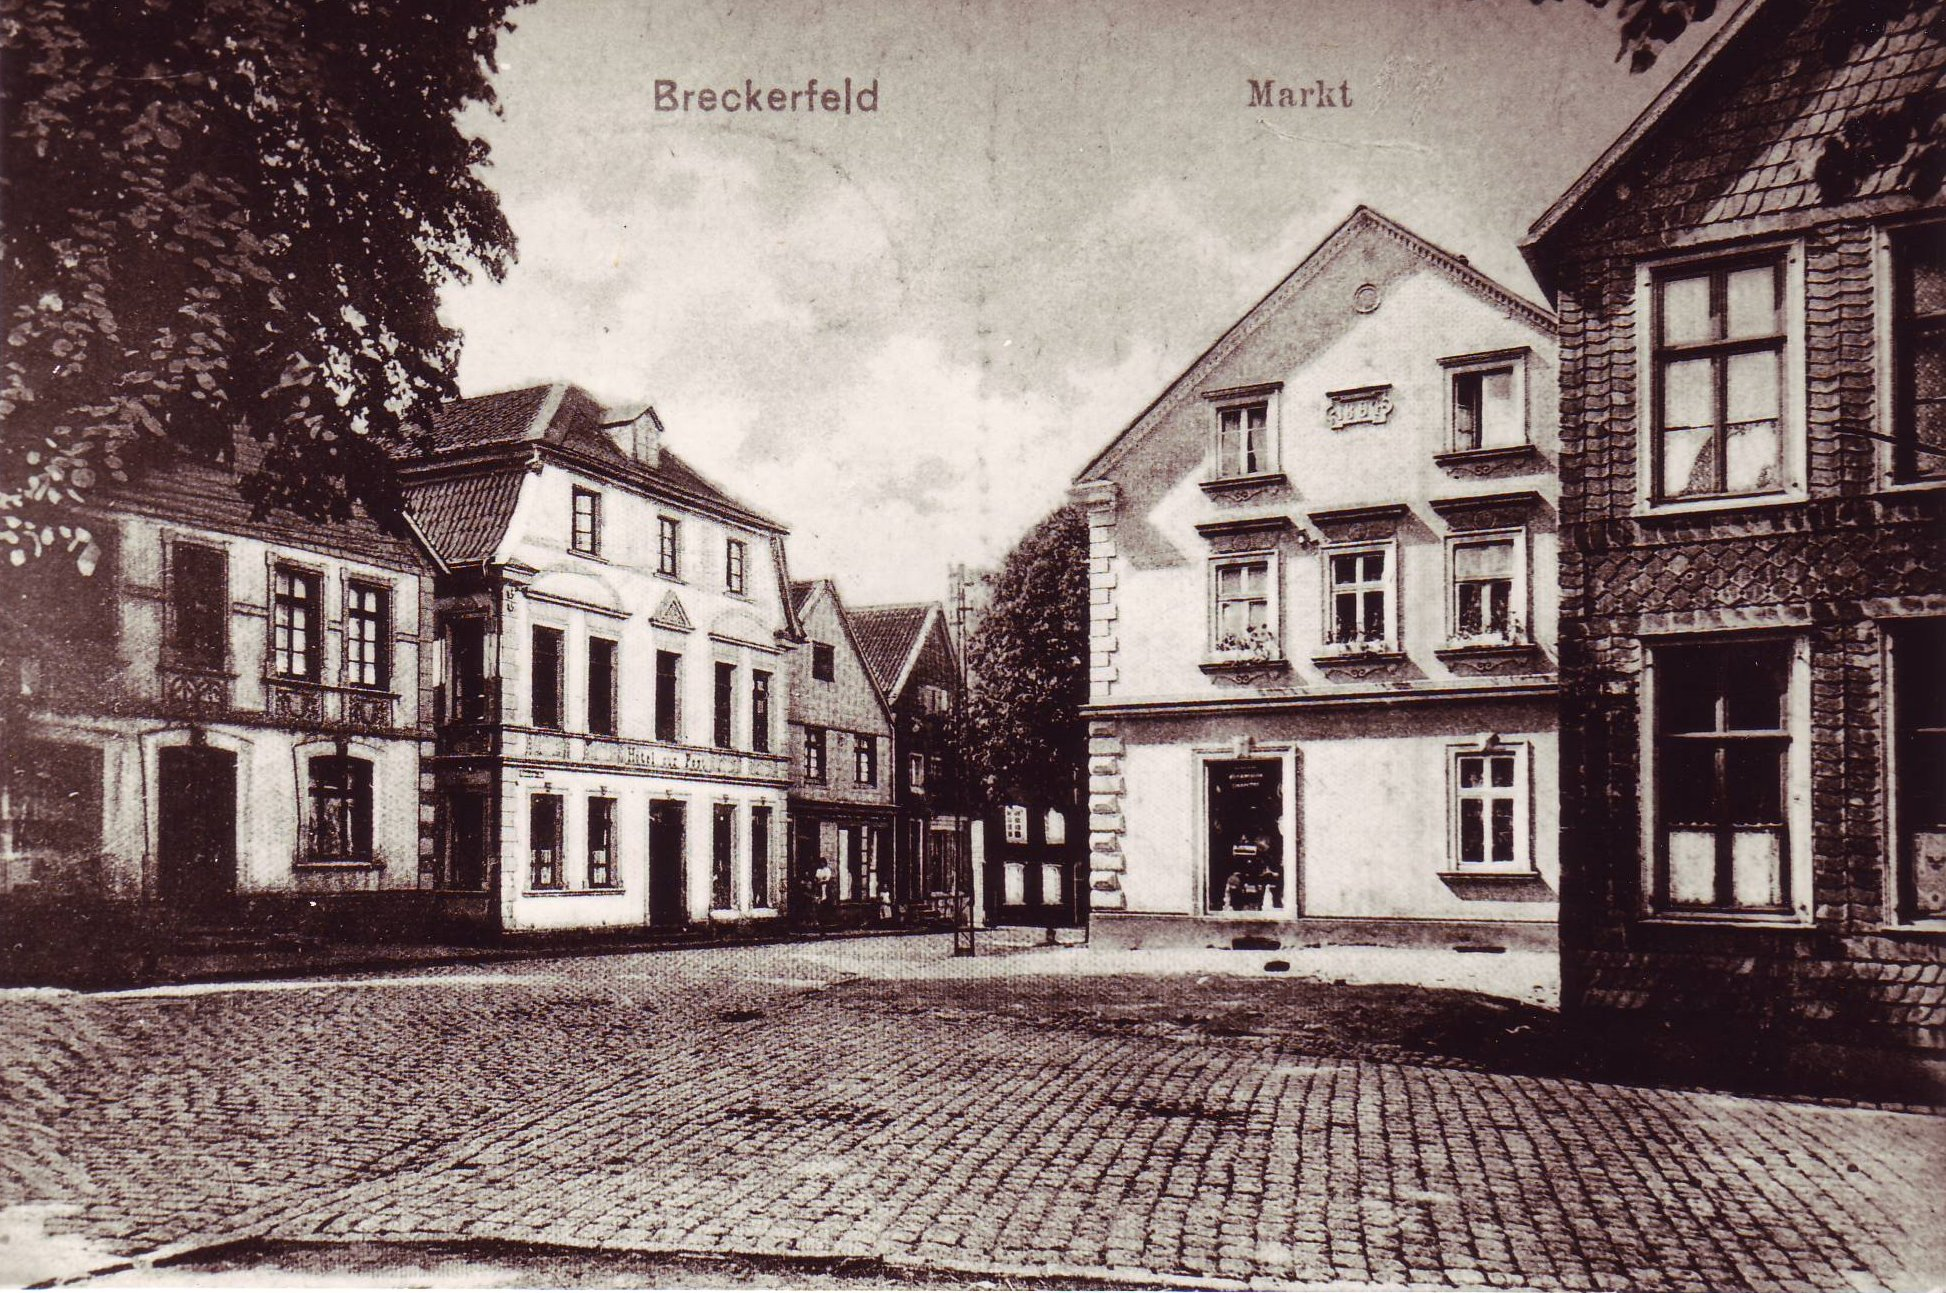 Frankfurter Straße Markt